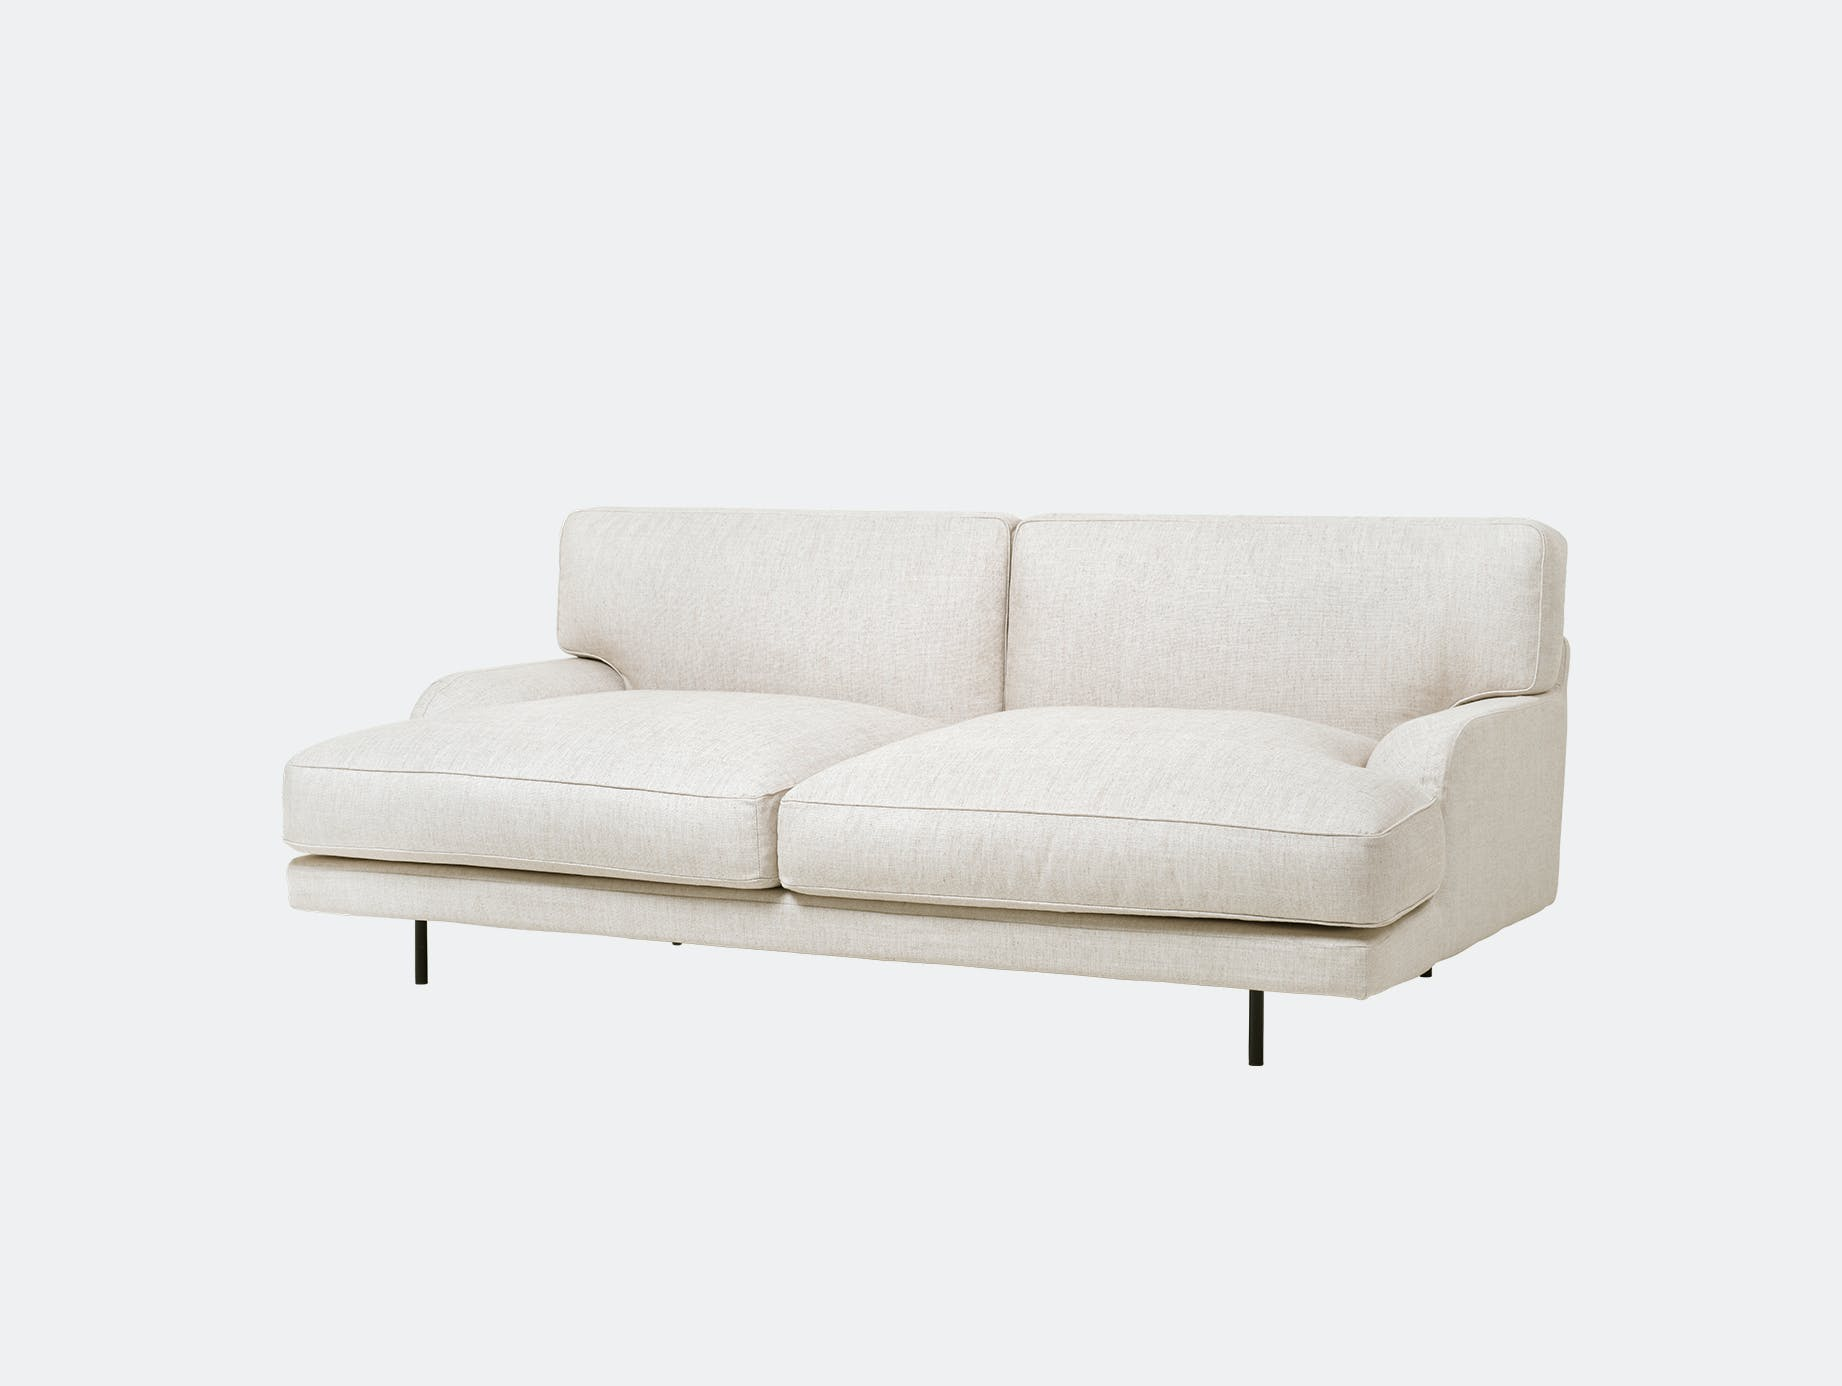 Gubi flaneur sofa 2 seat chambray24 blk d